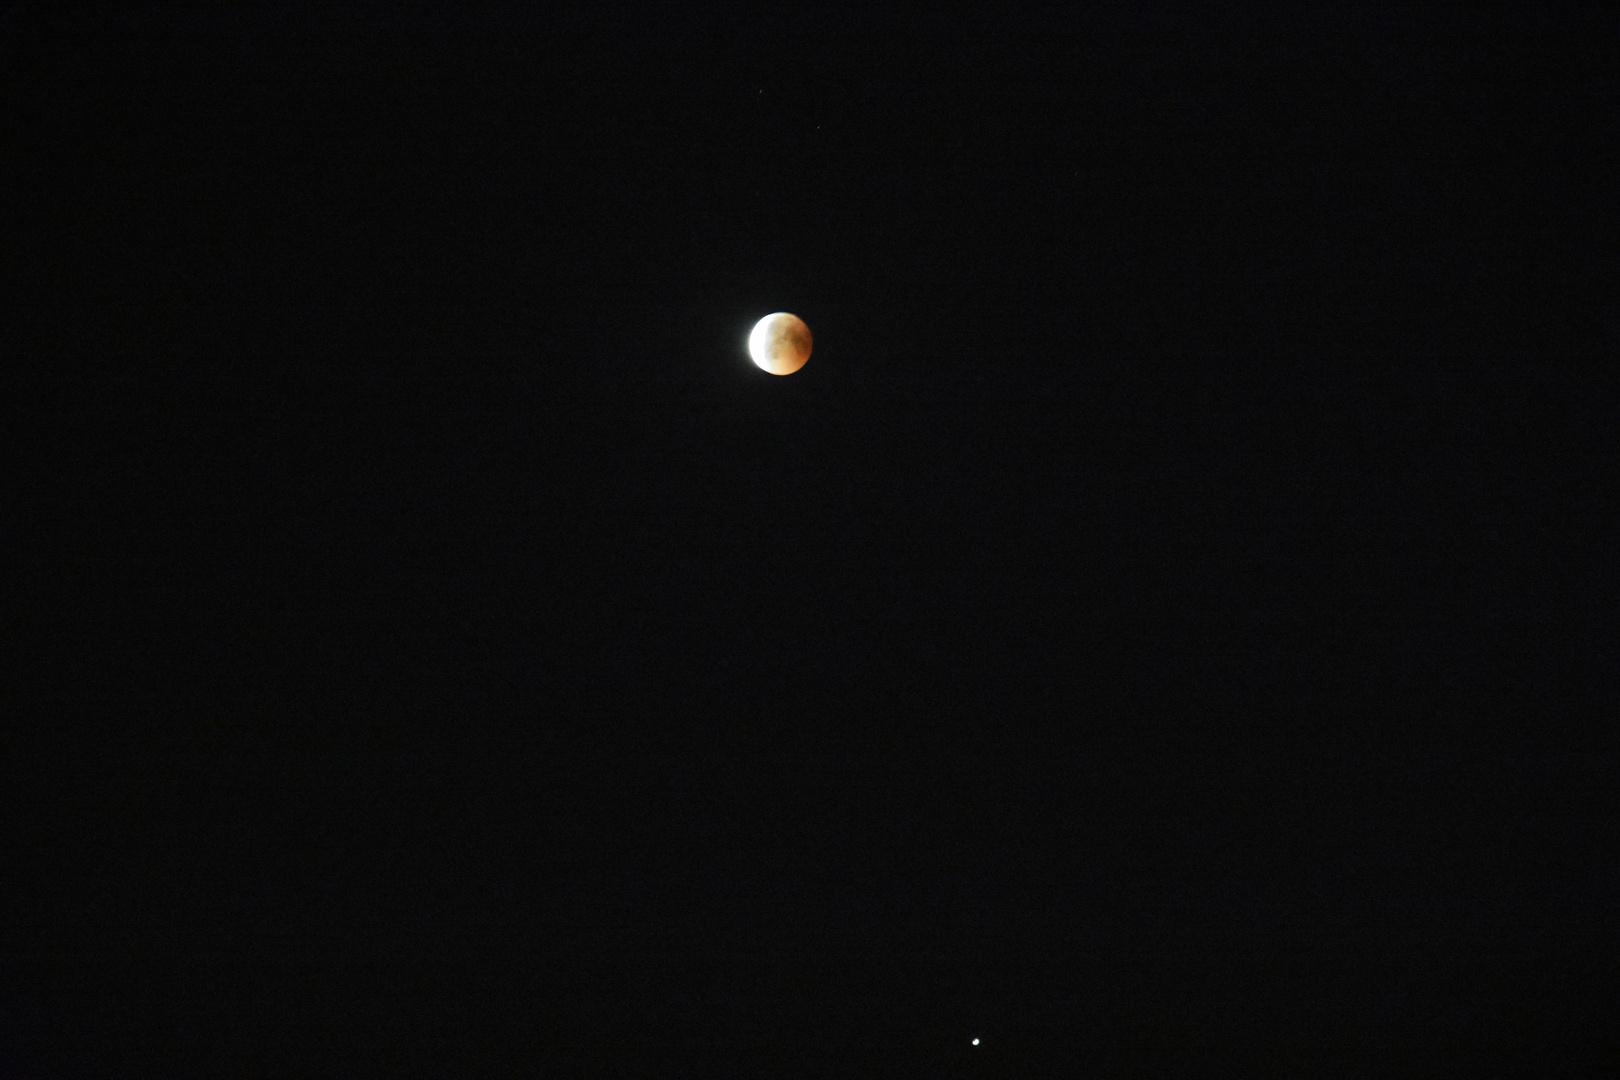 Totale Mondfinsternis 2018 mit dem Mars